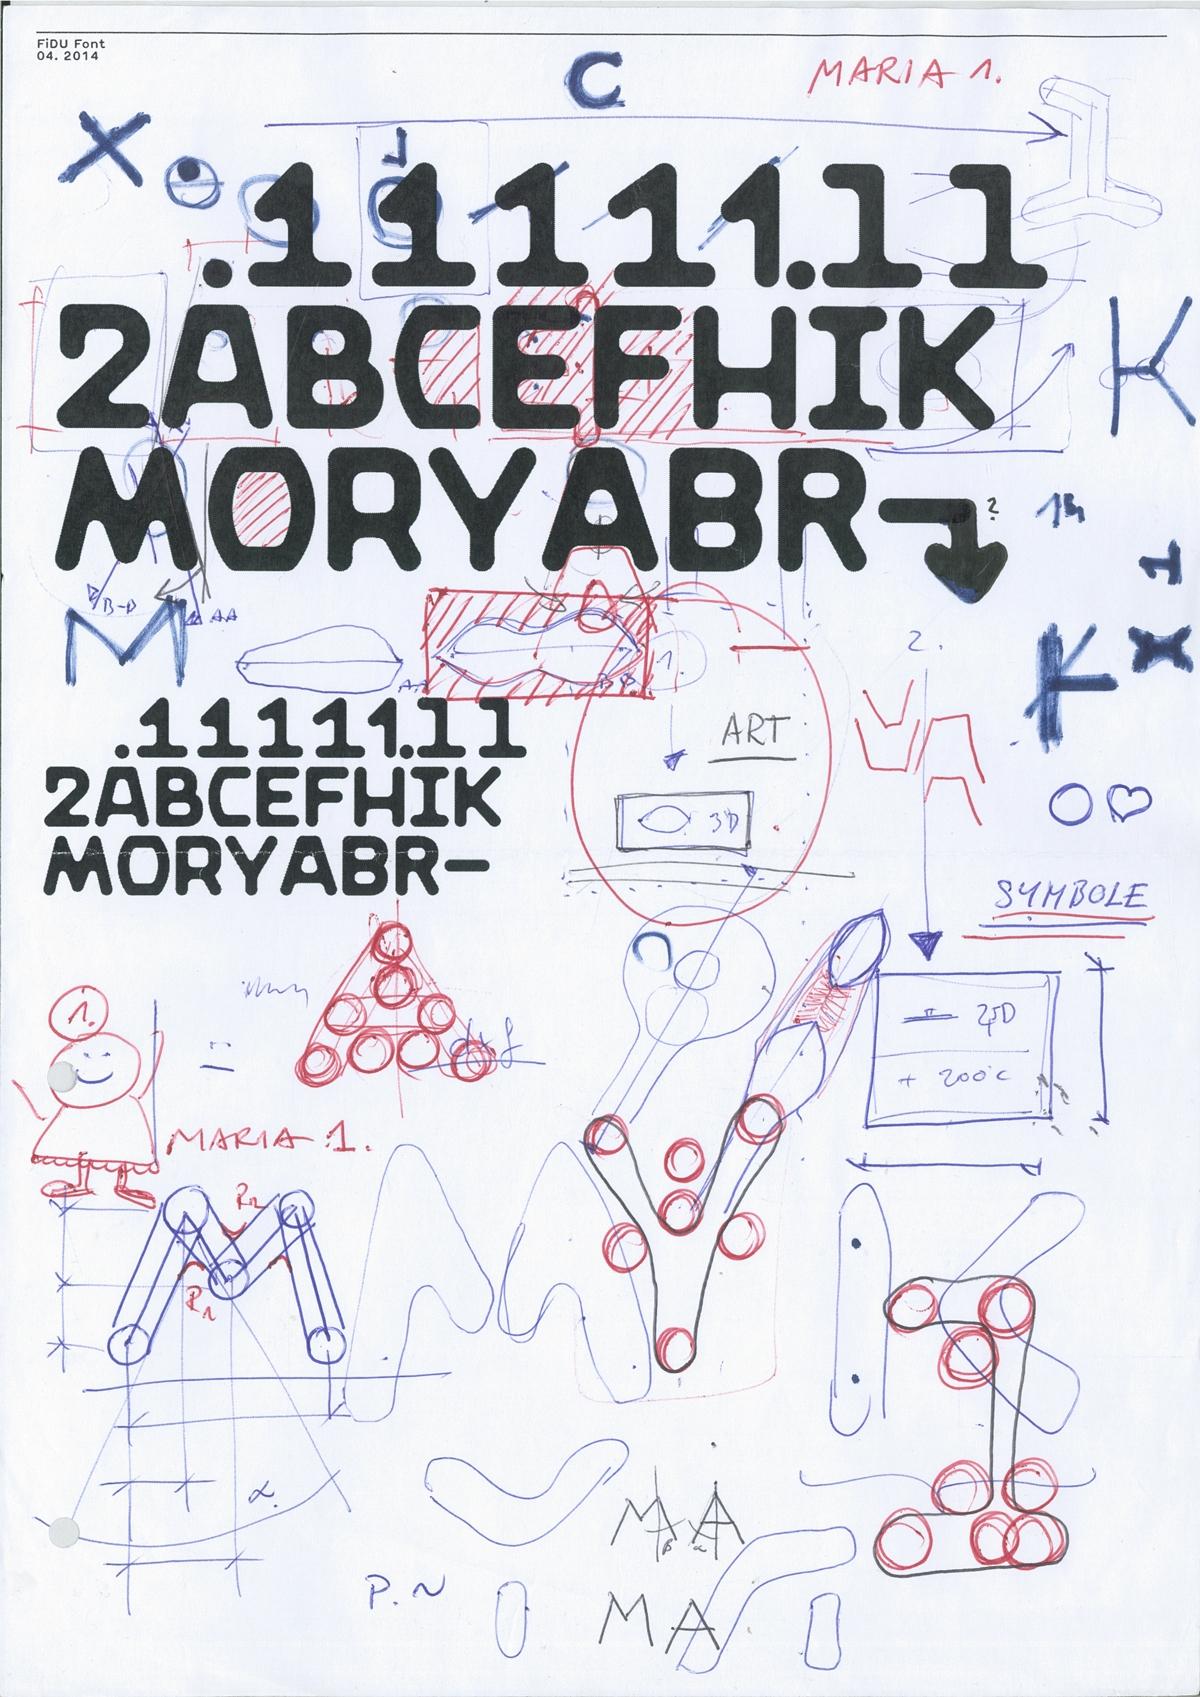 fidu_alfabet_making_of